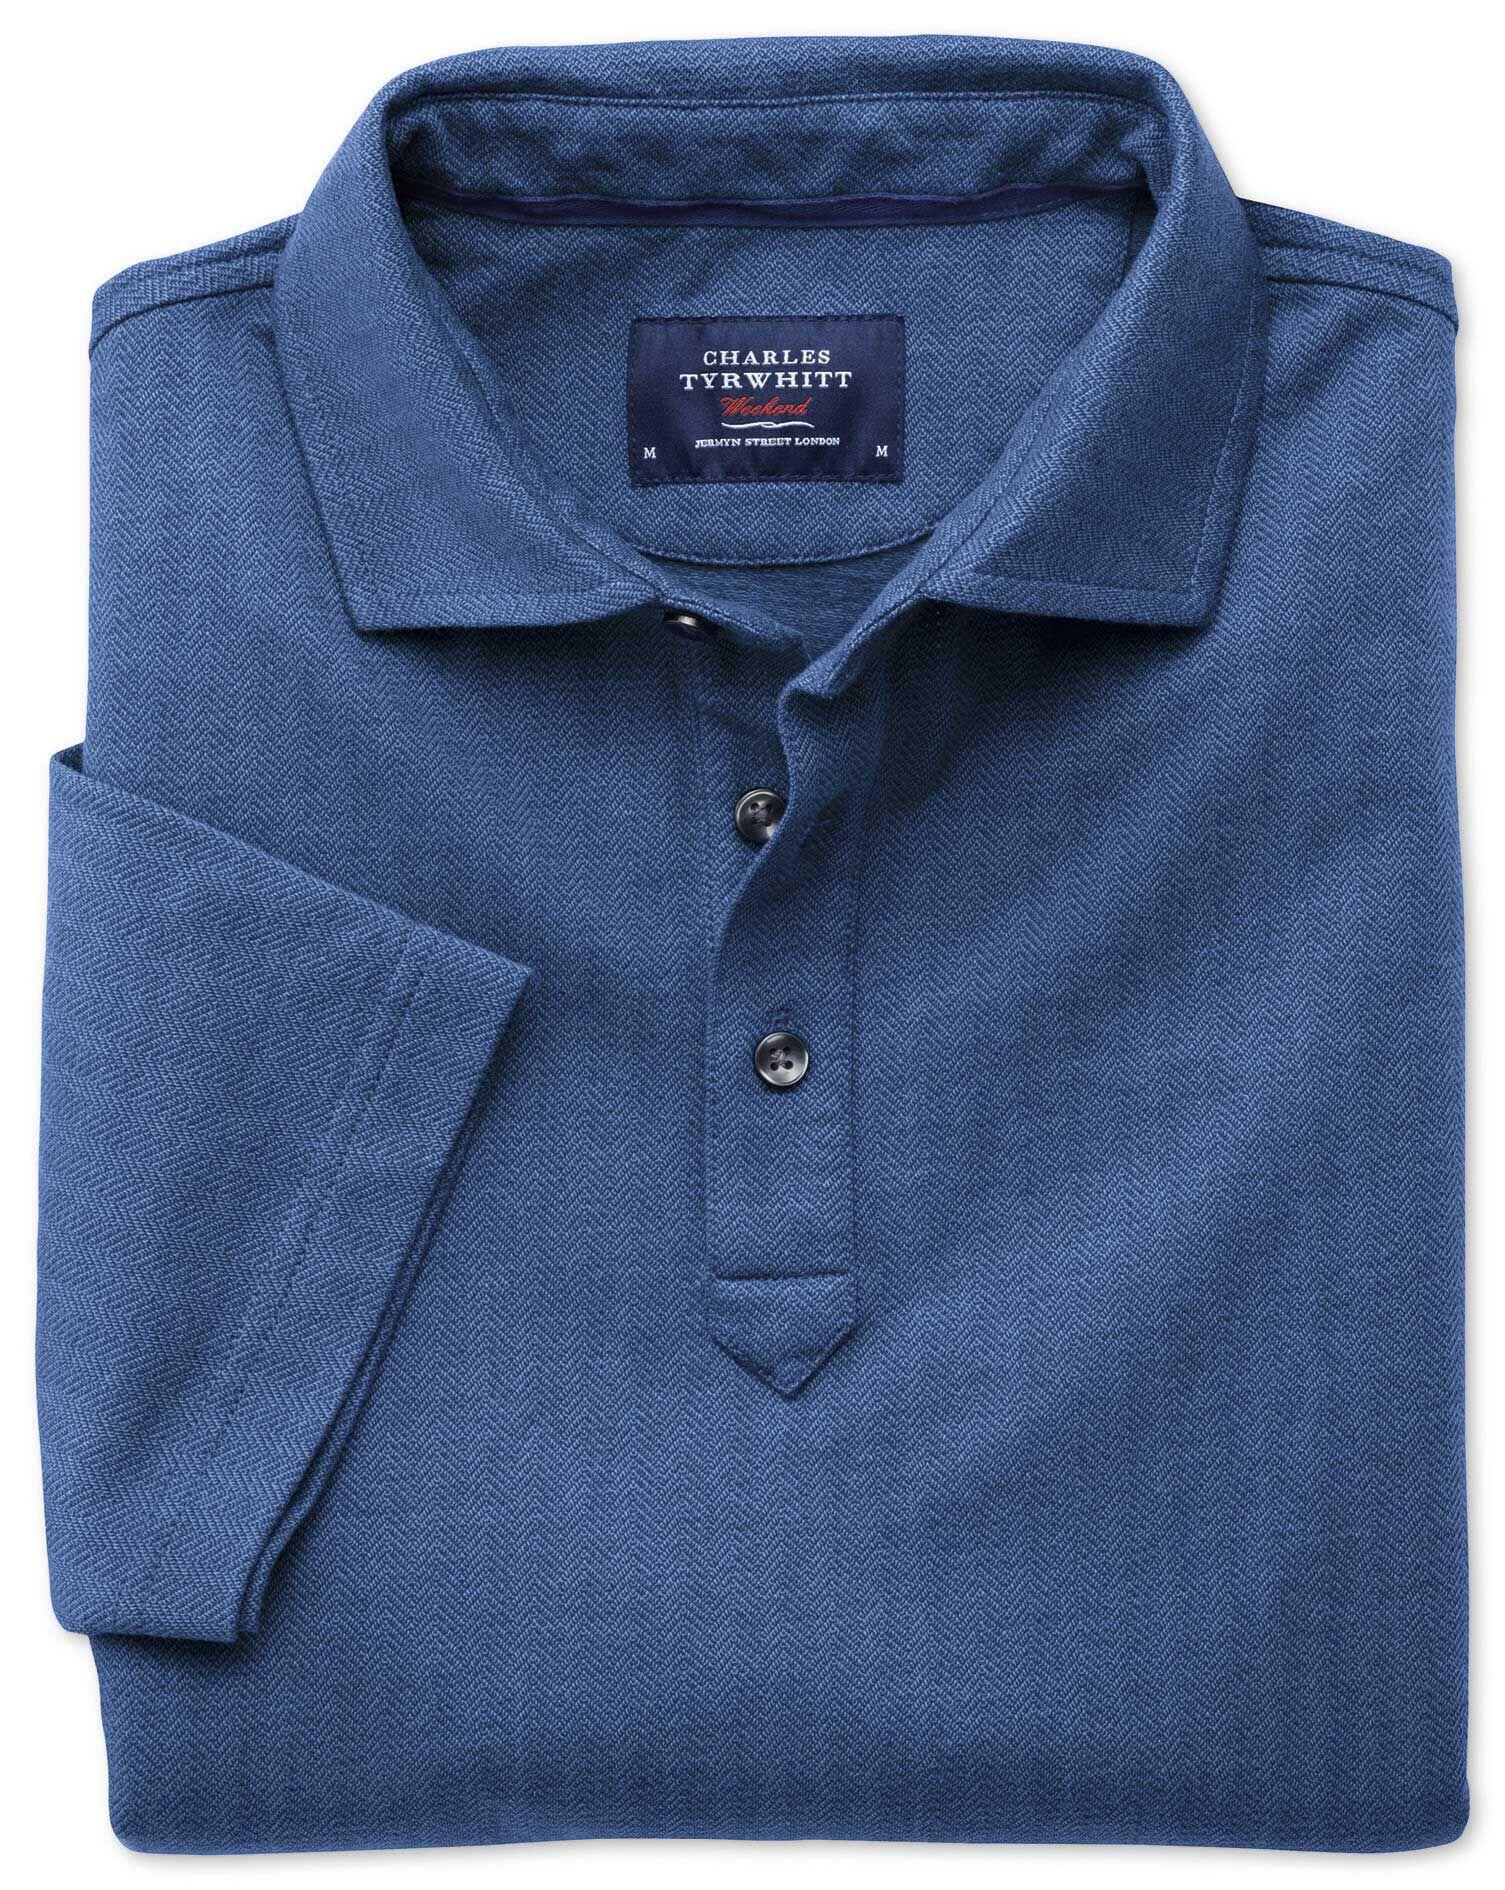 Blue Herringbone Cotton Polo Size Medium by Charles Tyrwhitt